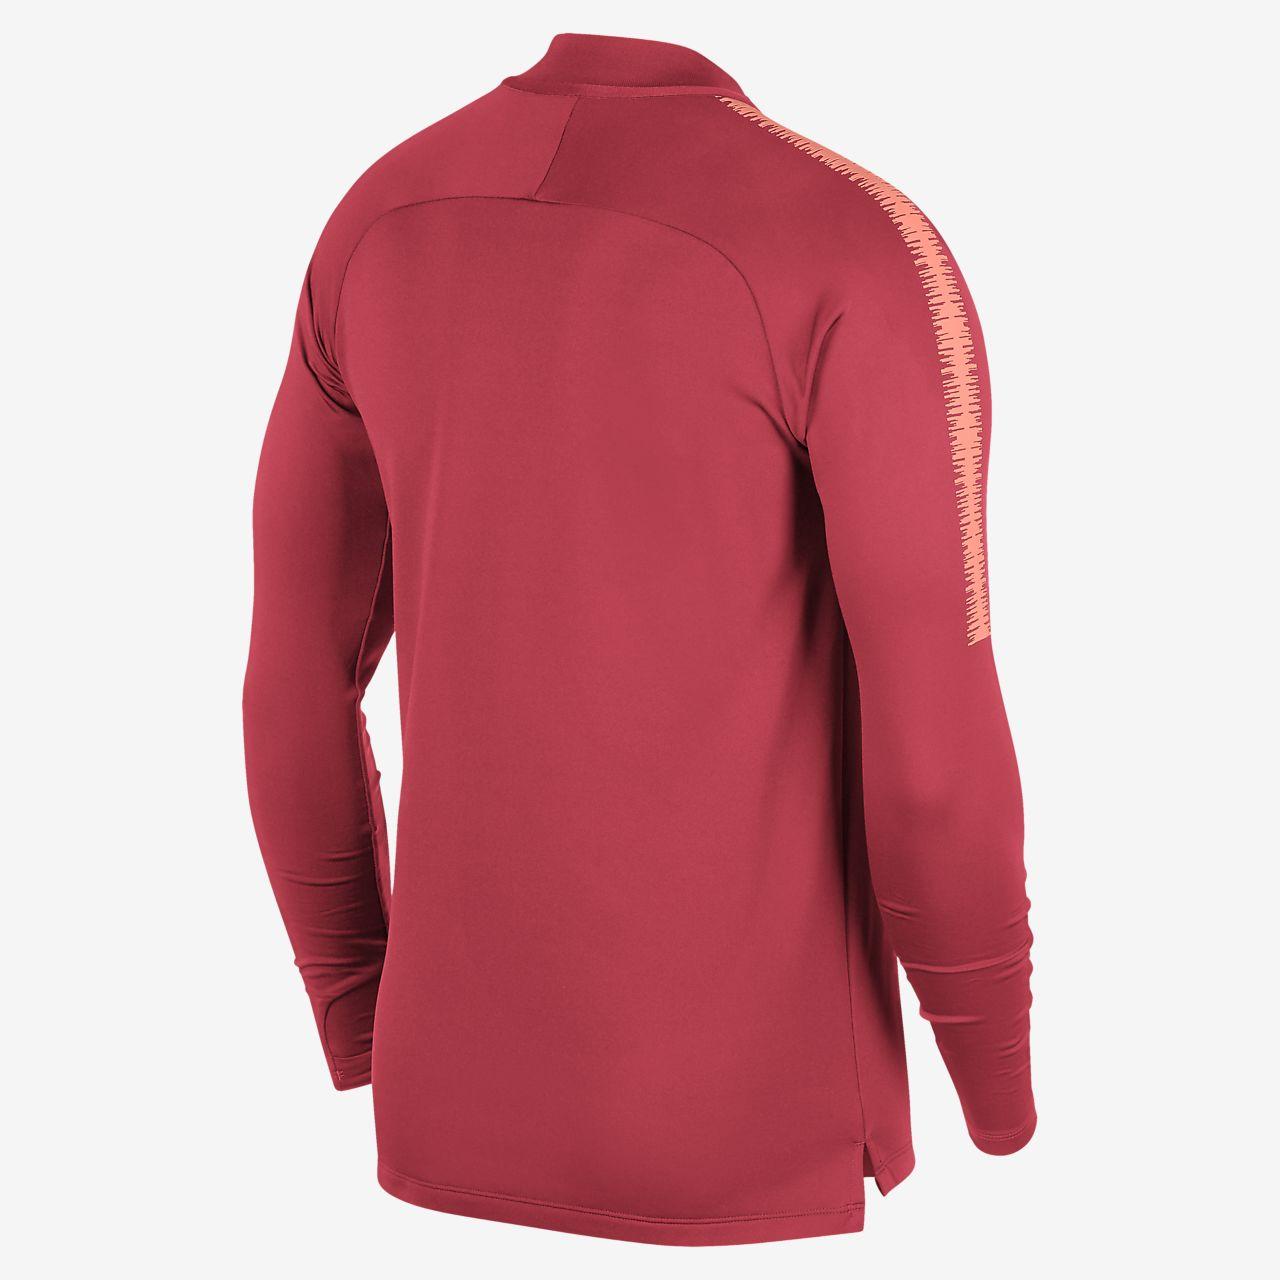 6542dc9f121 FC Barcelona Dri-FIT Squad Drill Men s Long Sleeve Soccer Top. Nike.com